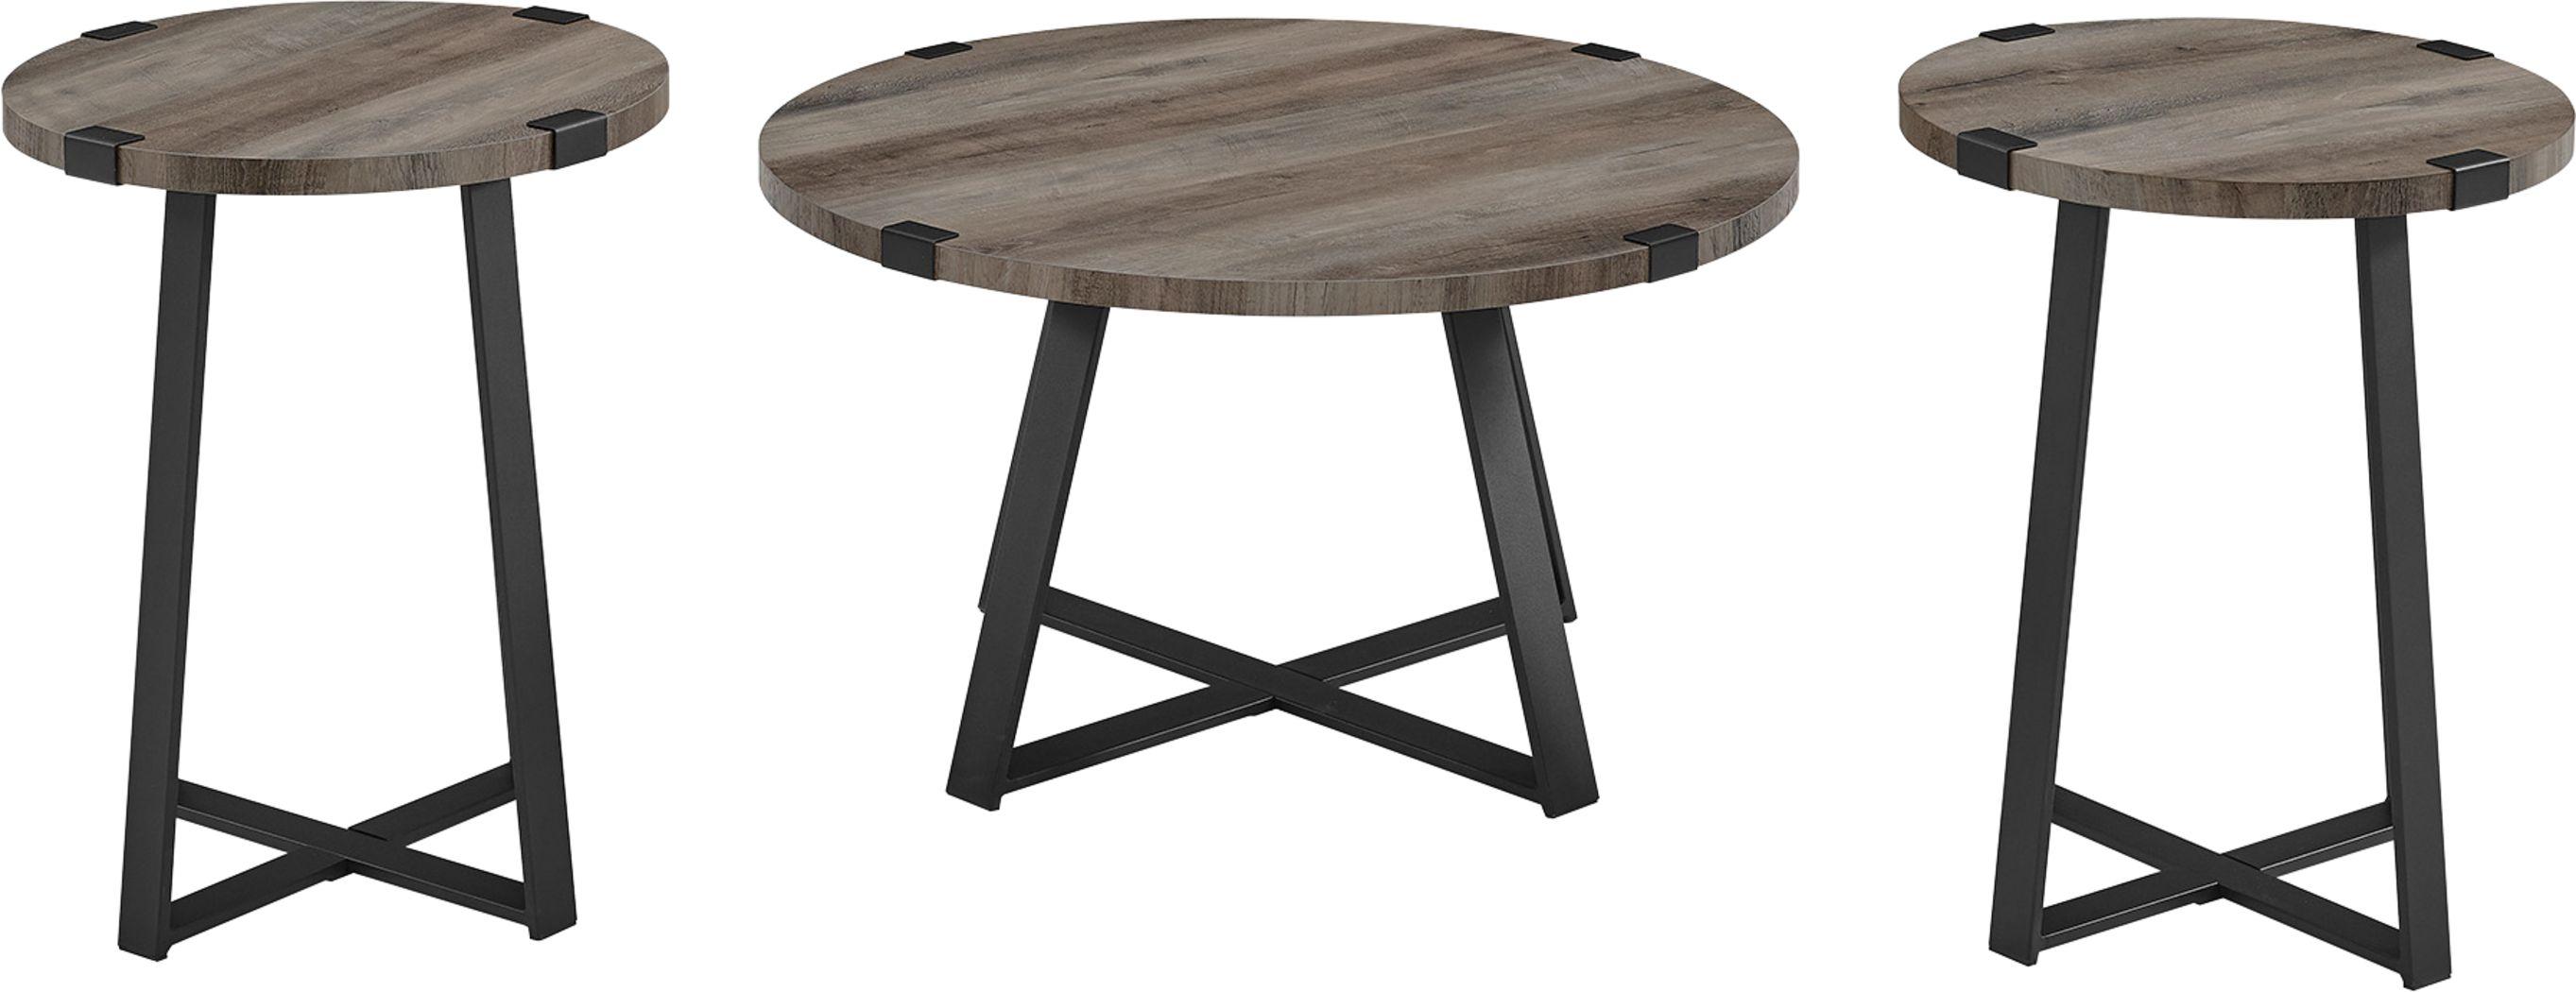 Castletroy Dark Gray Cocktail Table Set